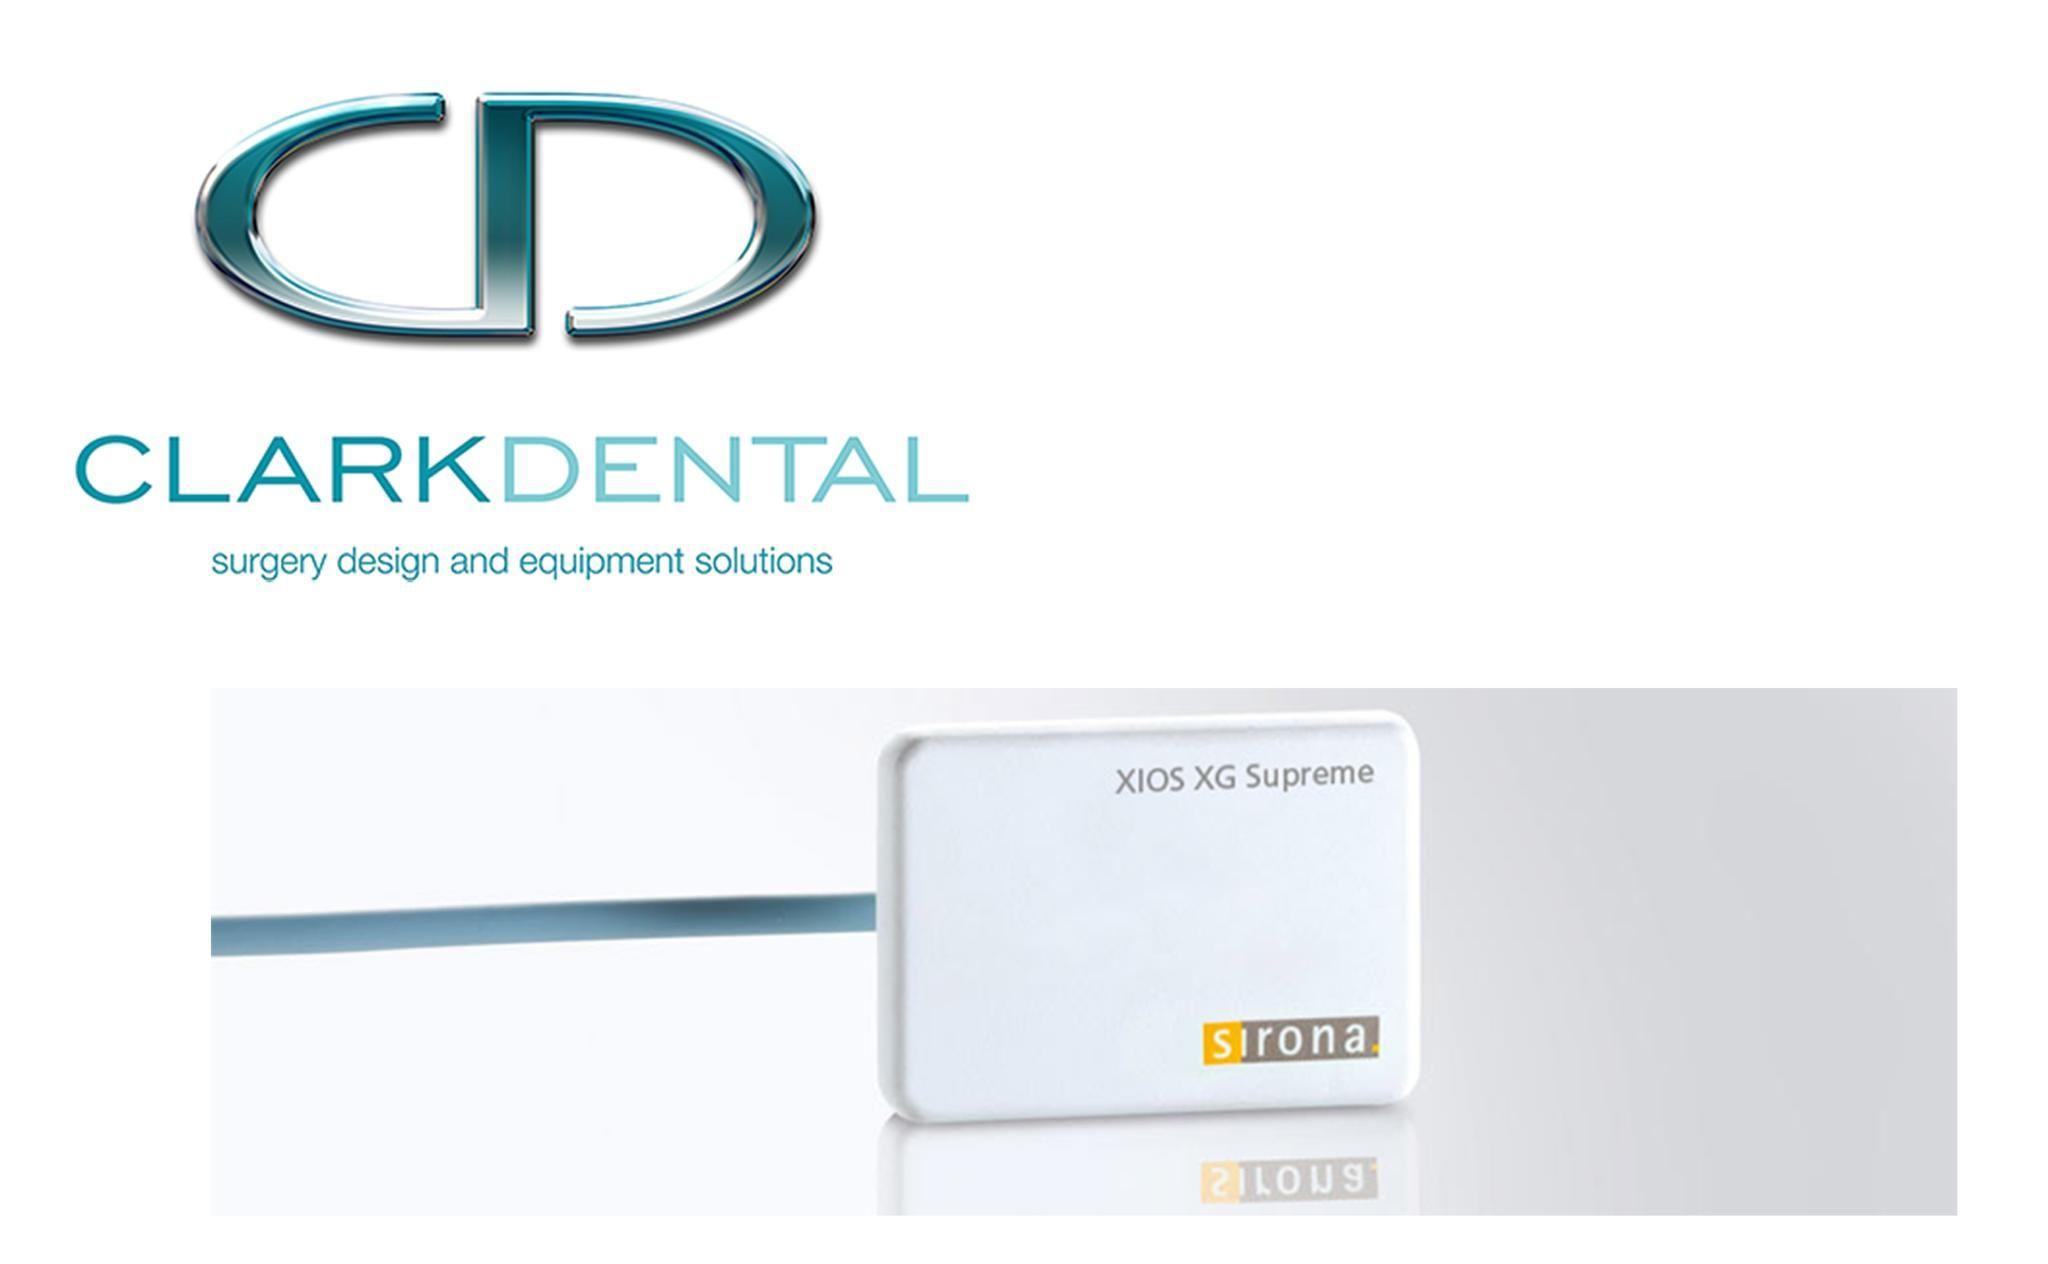 Optimal solutions from Clark Dental